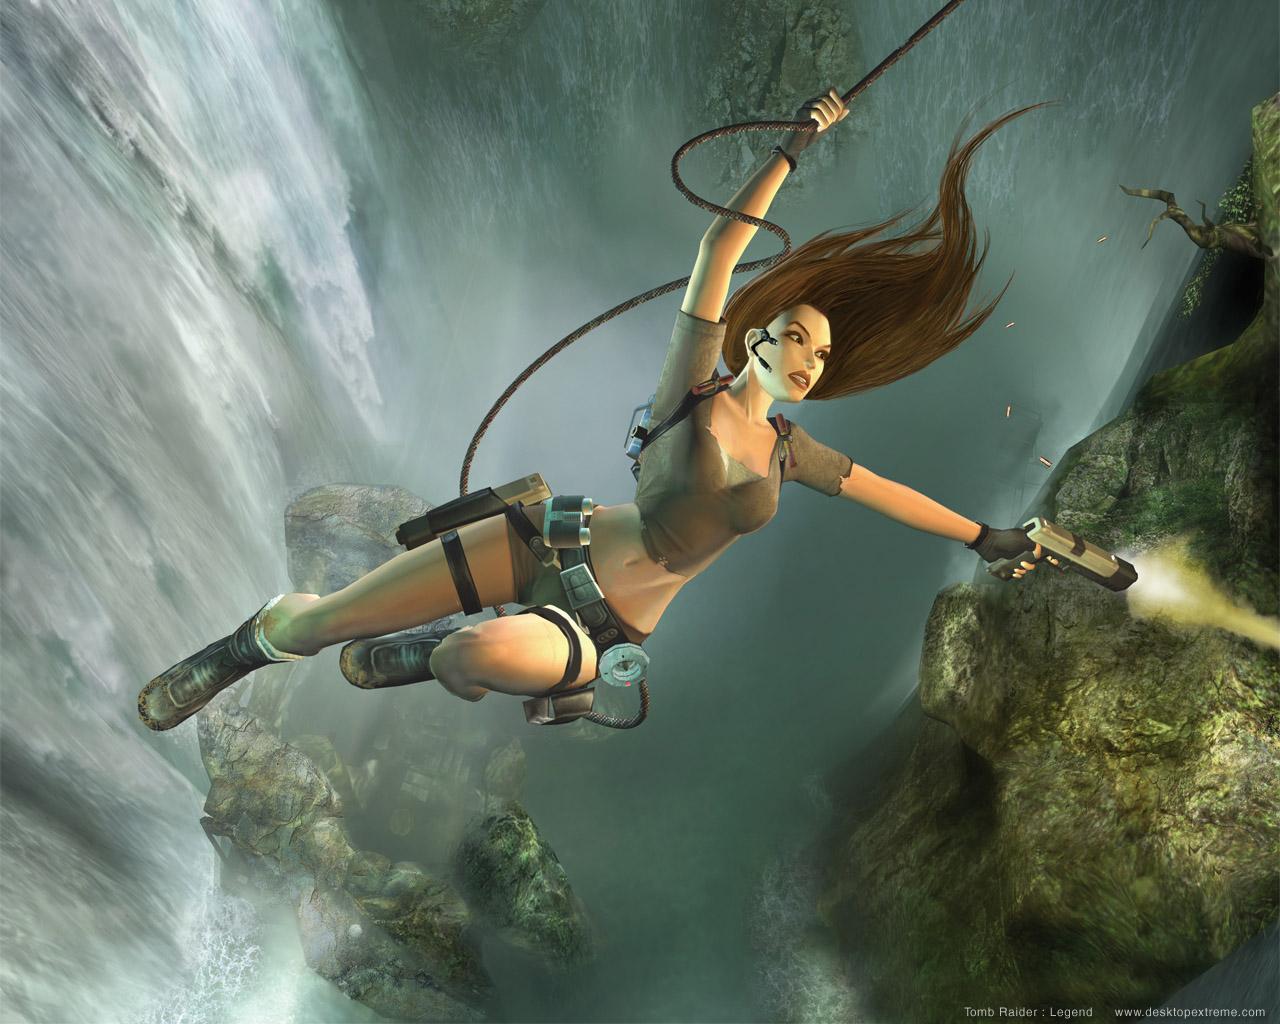 Lara Croft Tomb Raider Legend Full version Free Download